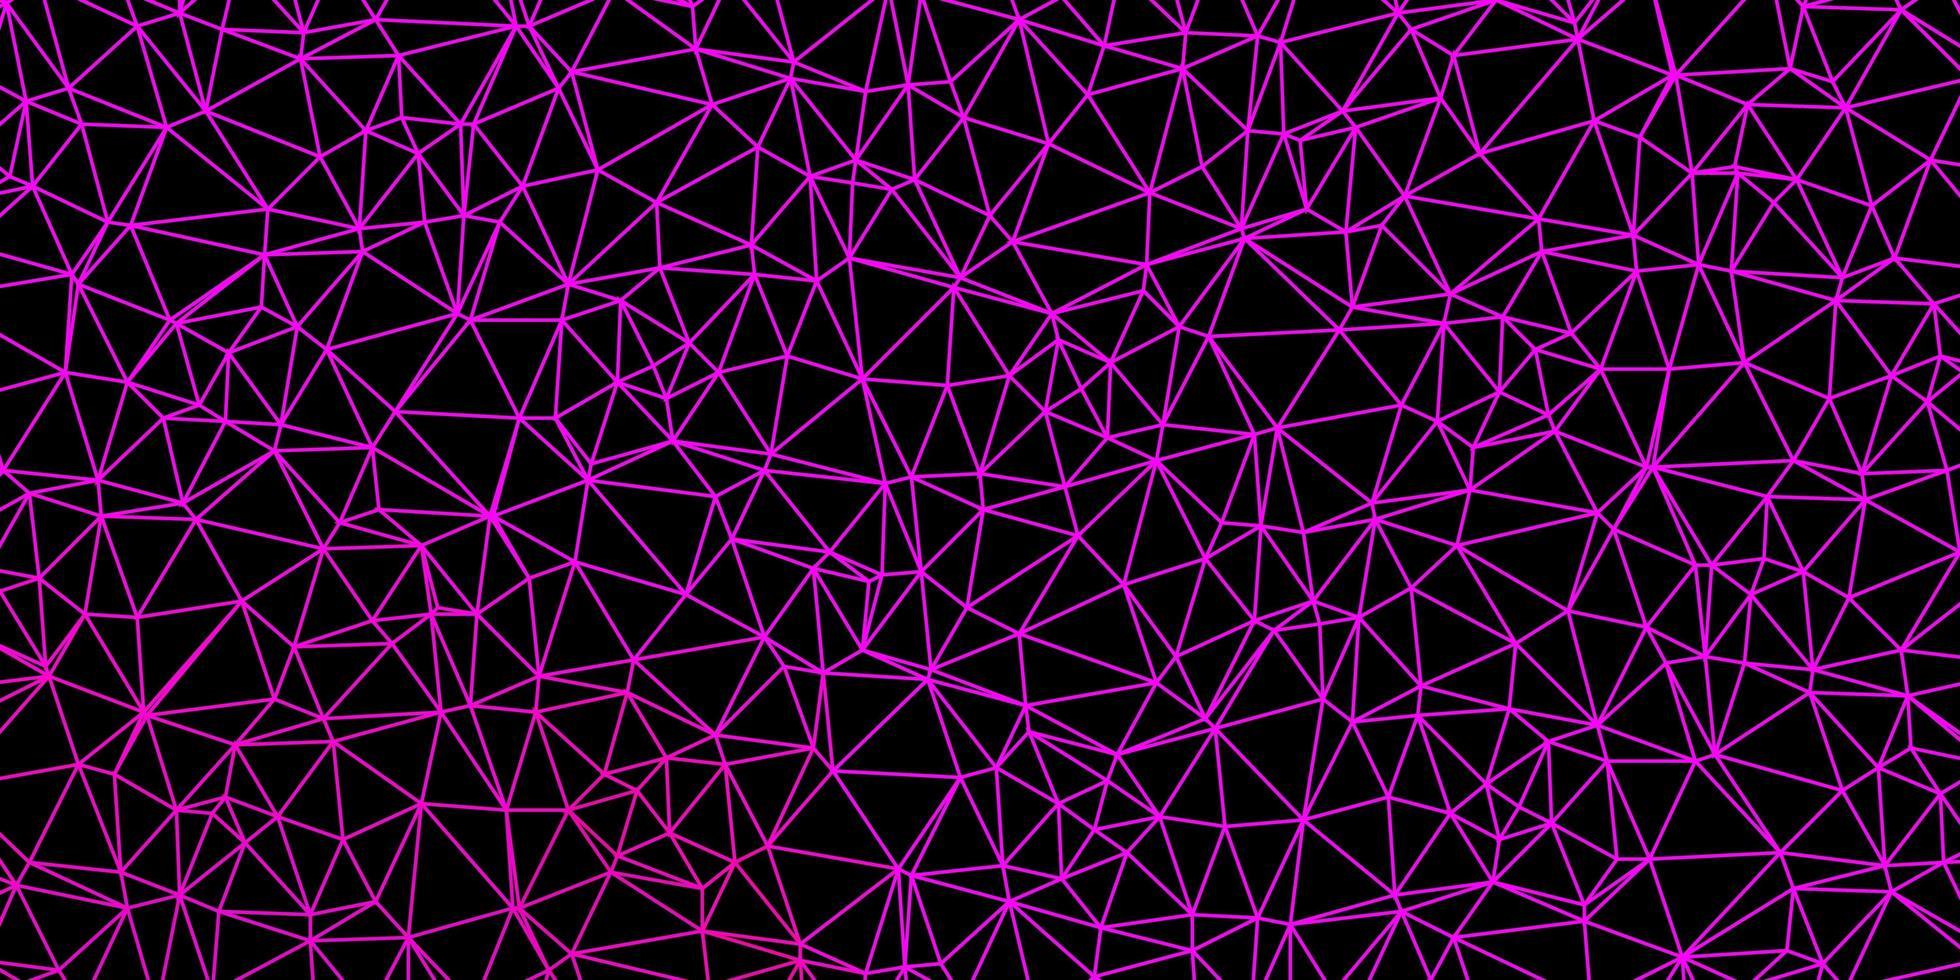 ljusrosa vektor poly triangel layout.